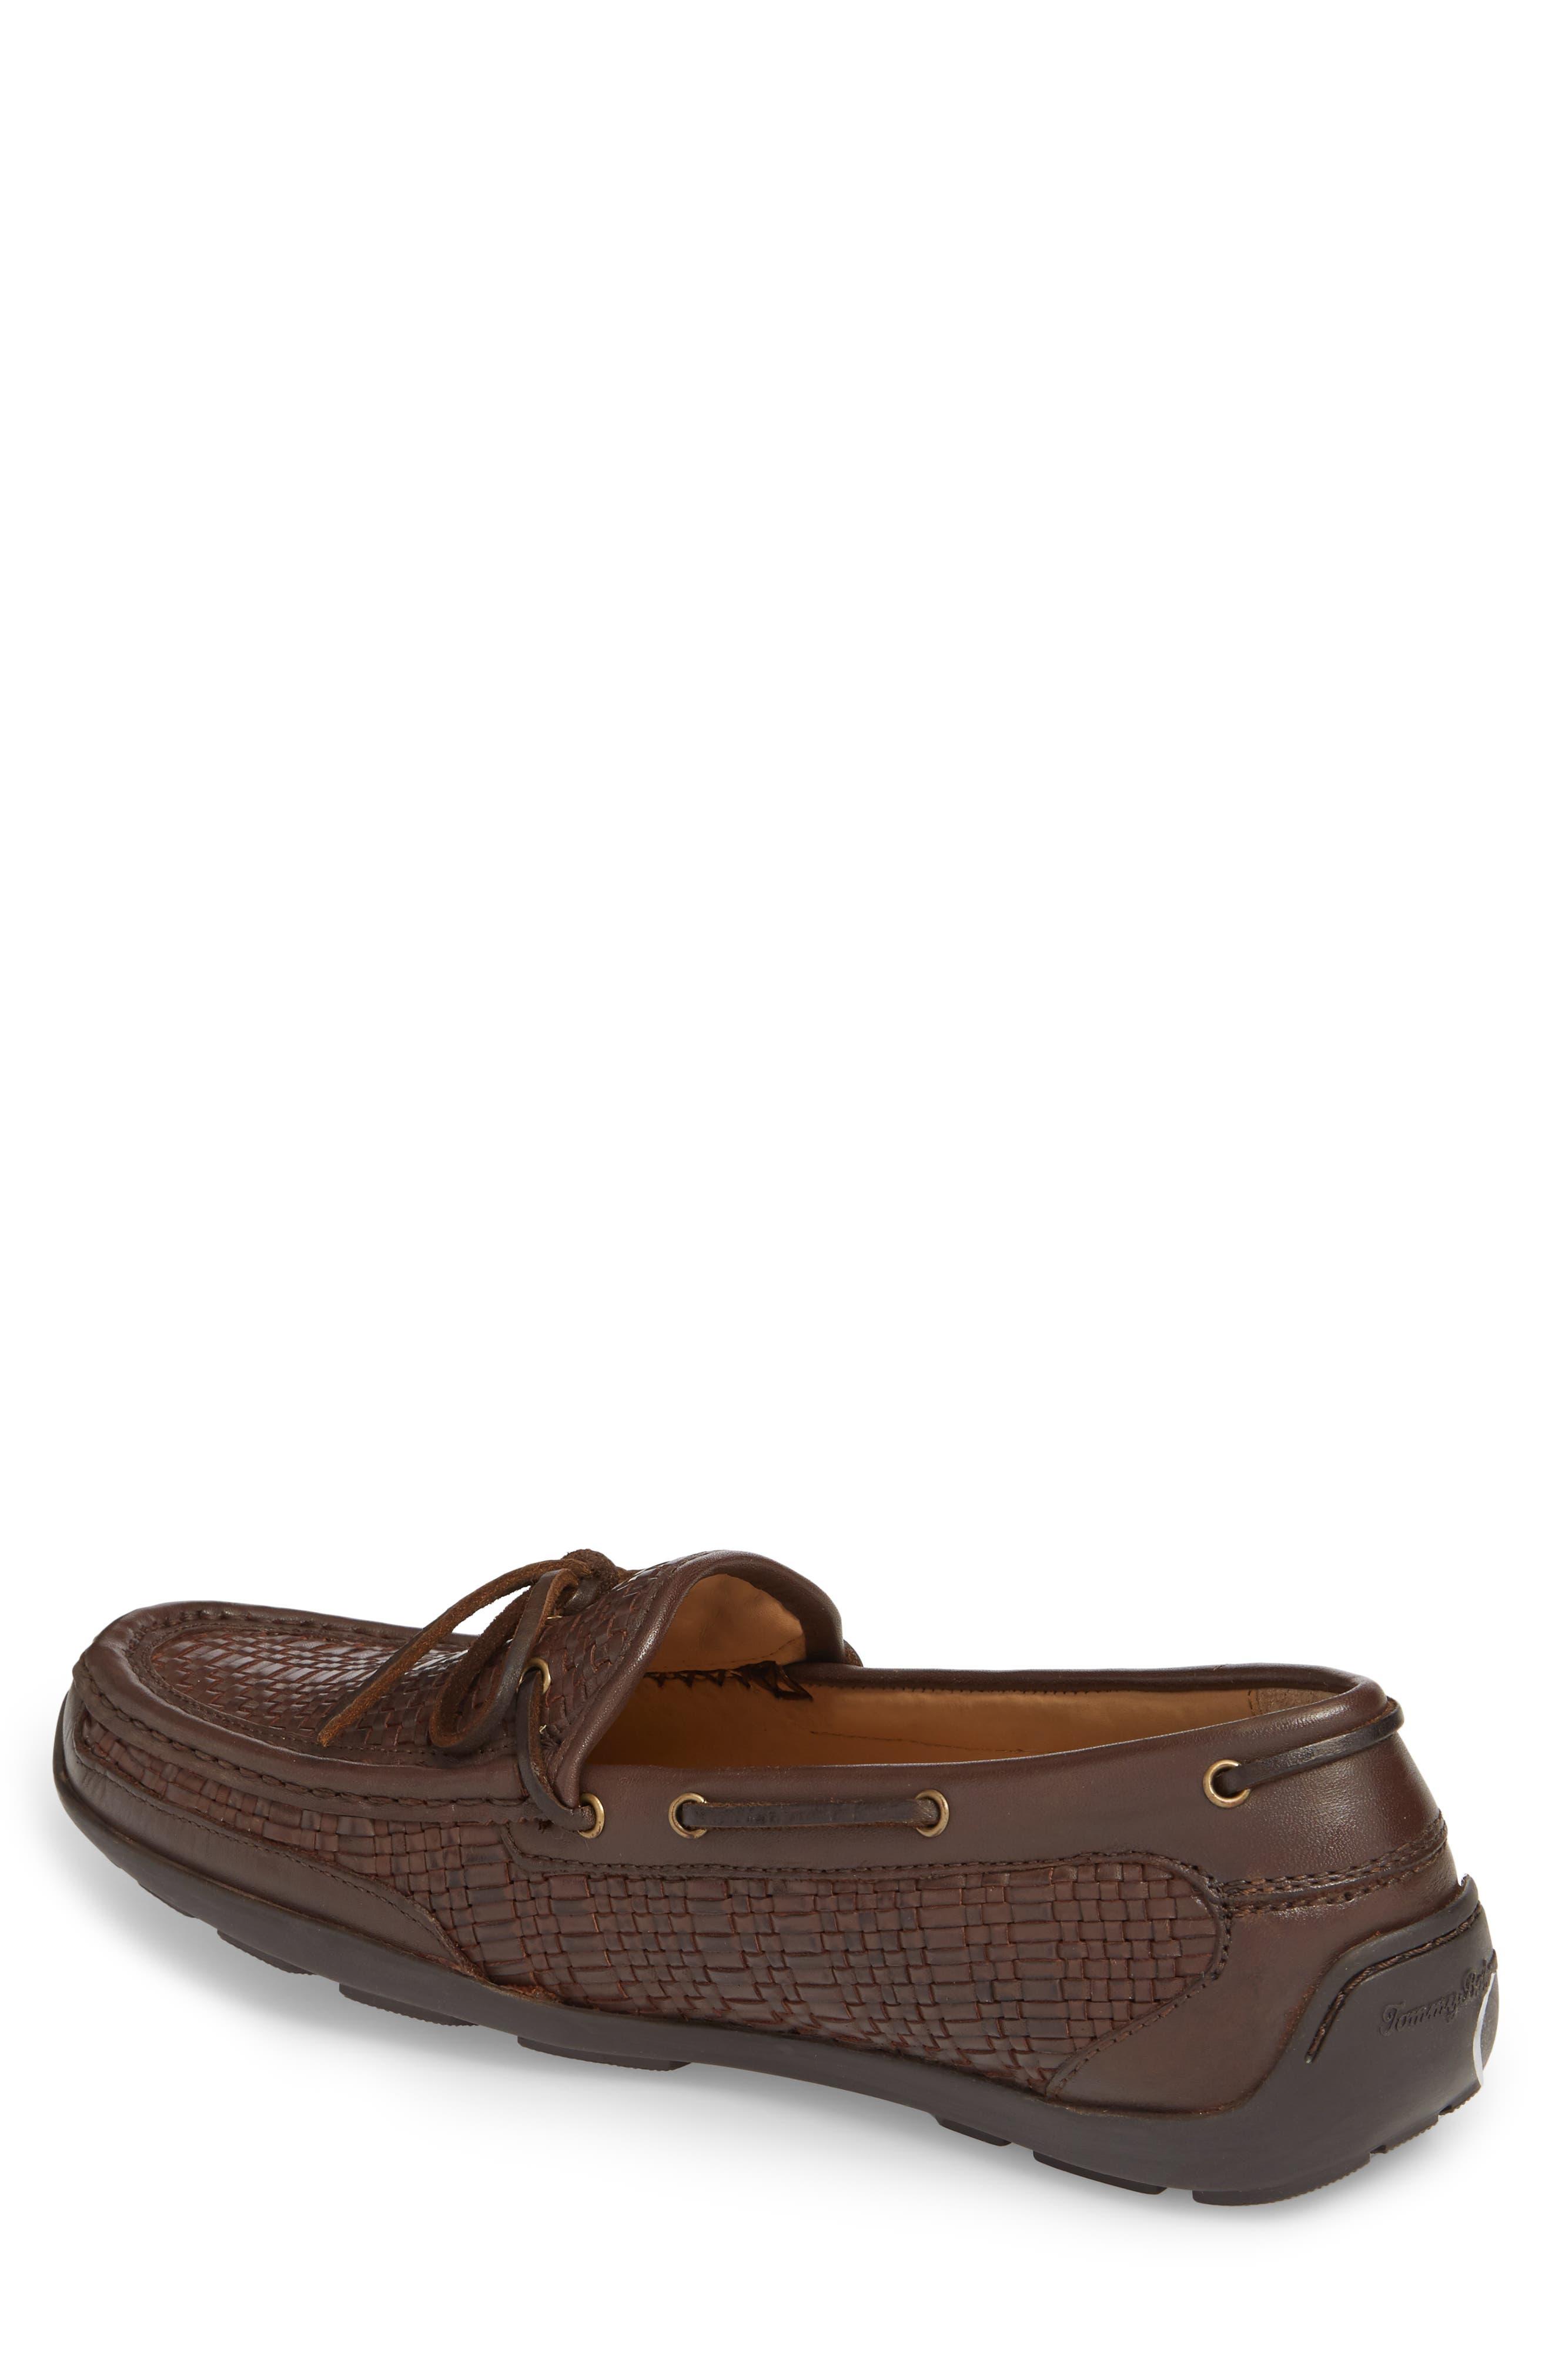 Tommy Bahama Men's Tangier Driving Shoe